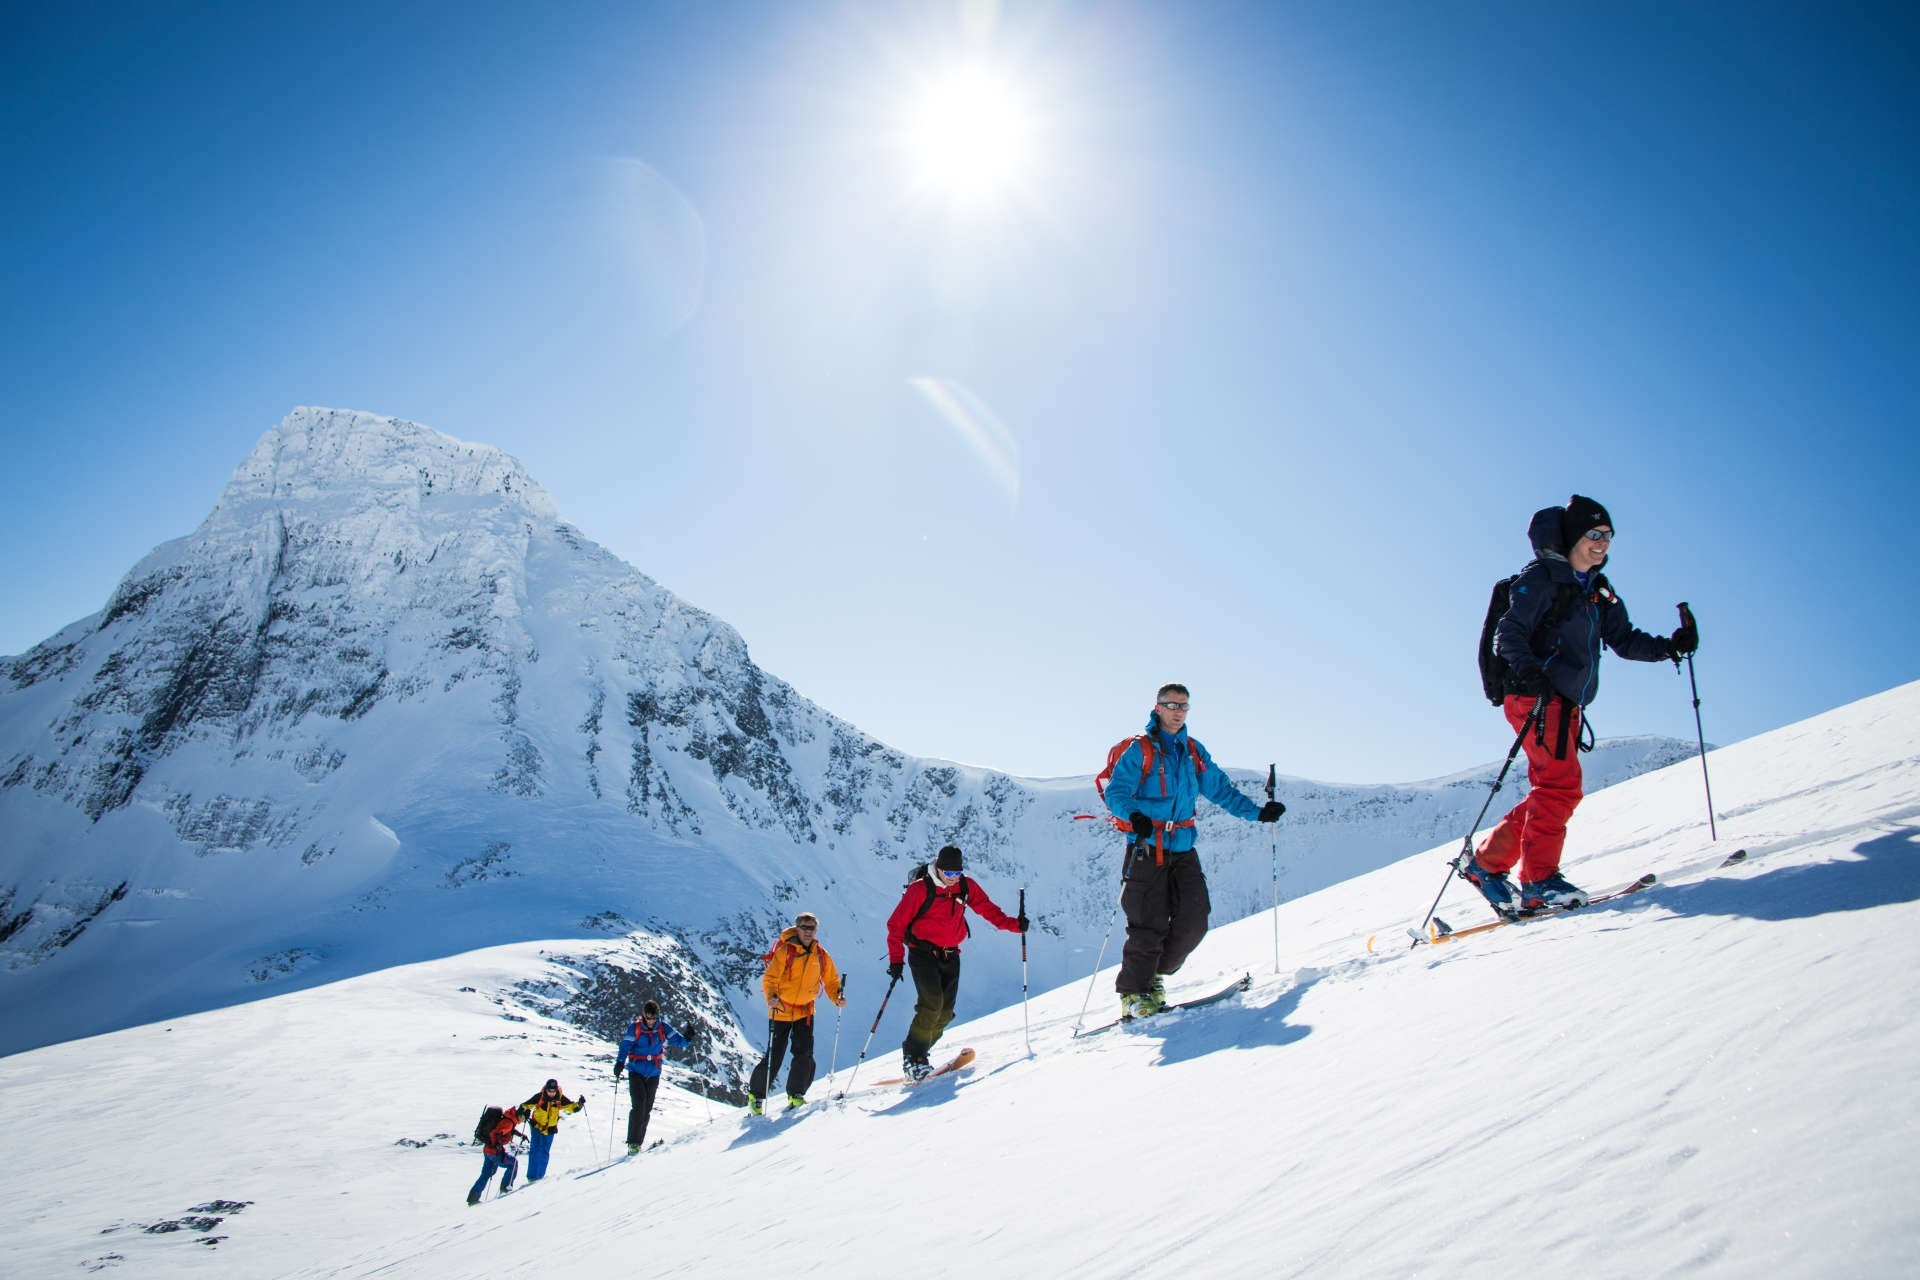 Backcountry skiing off the beaten track 2.jpg